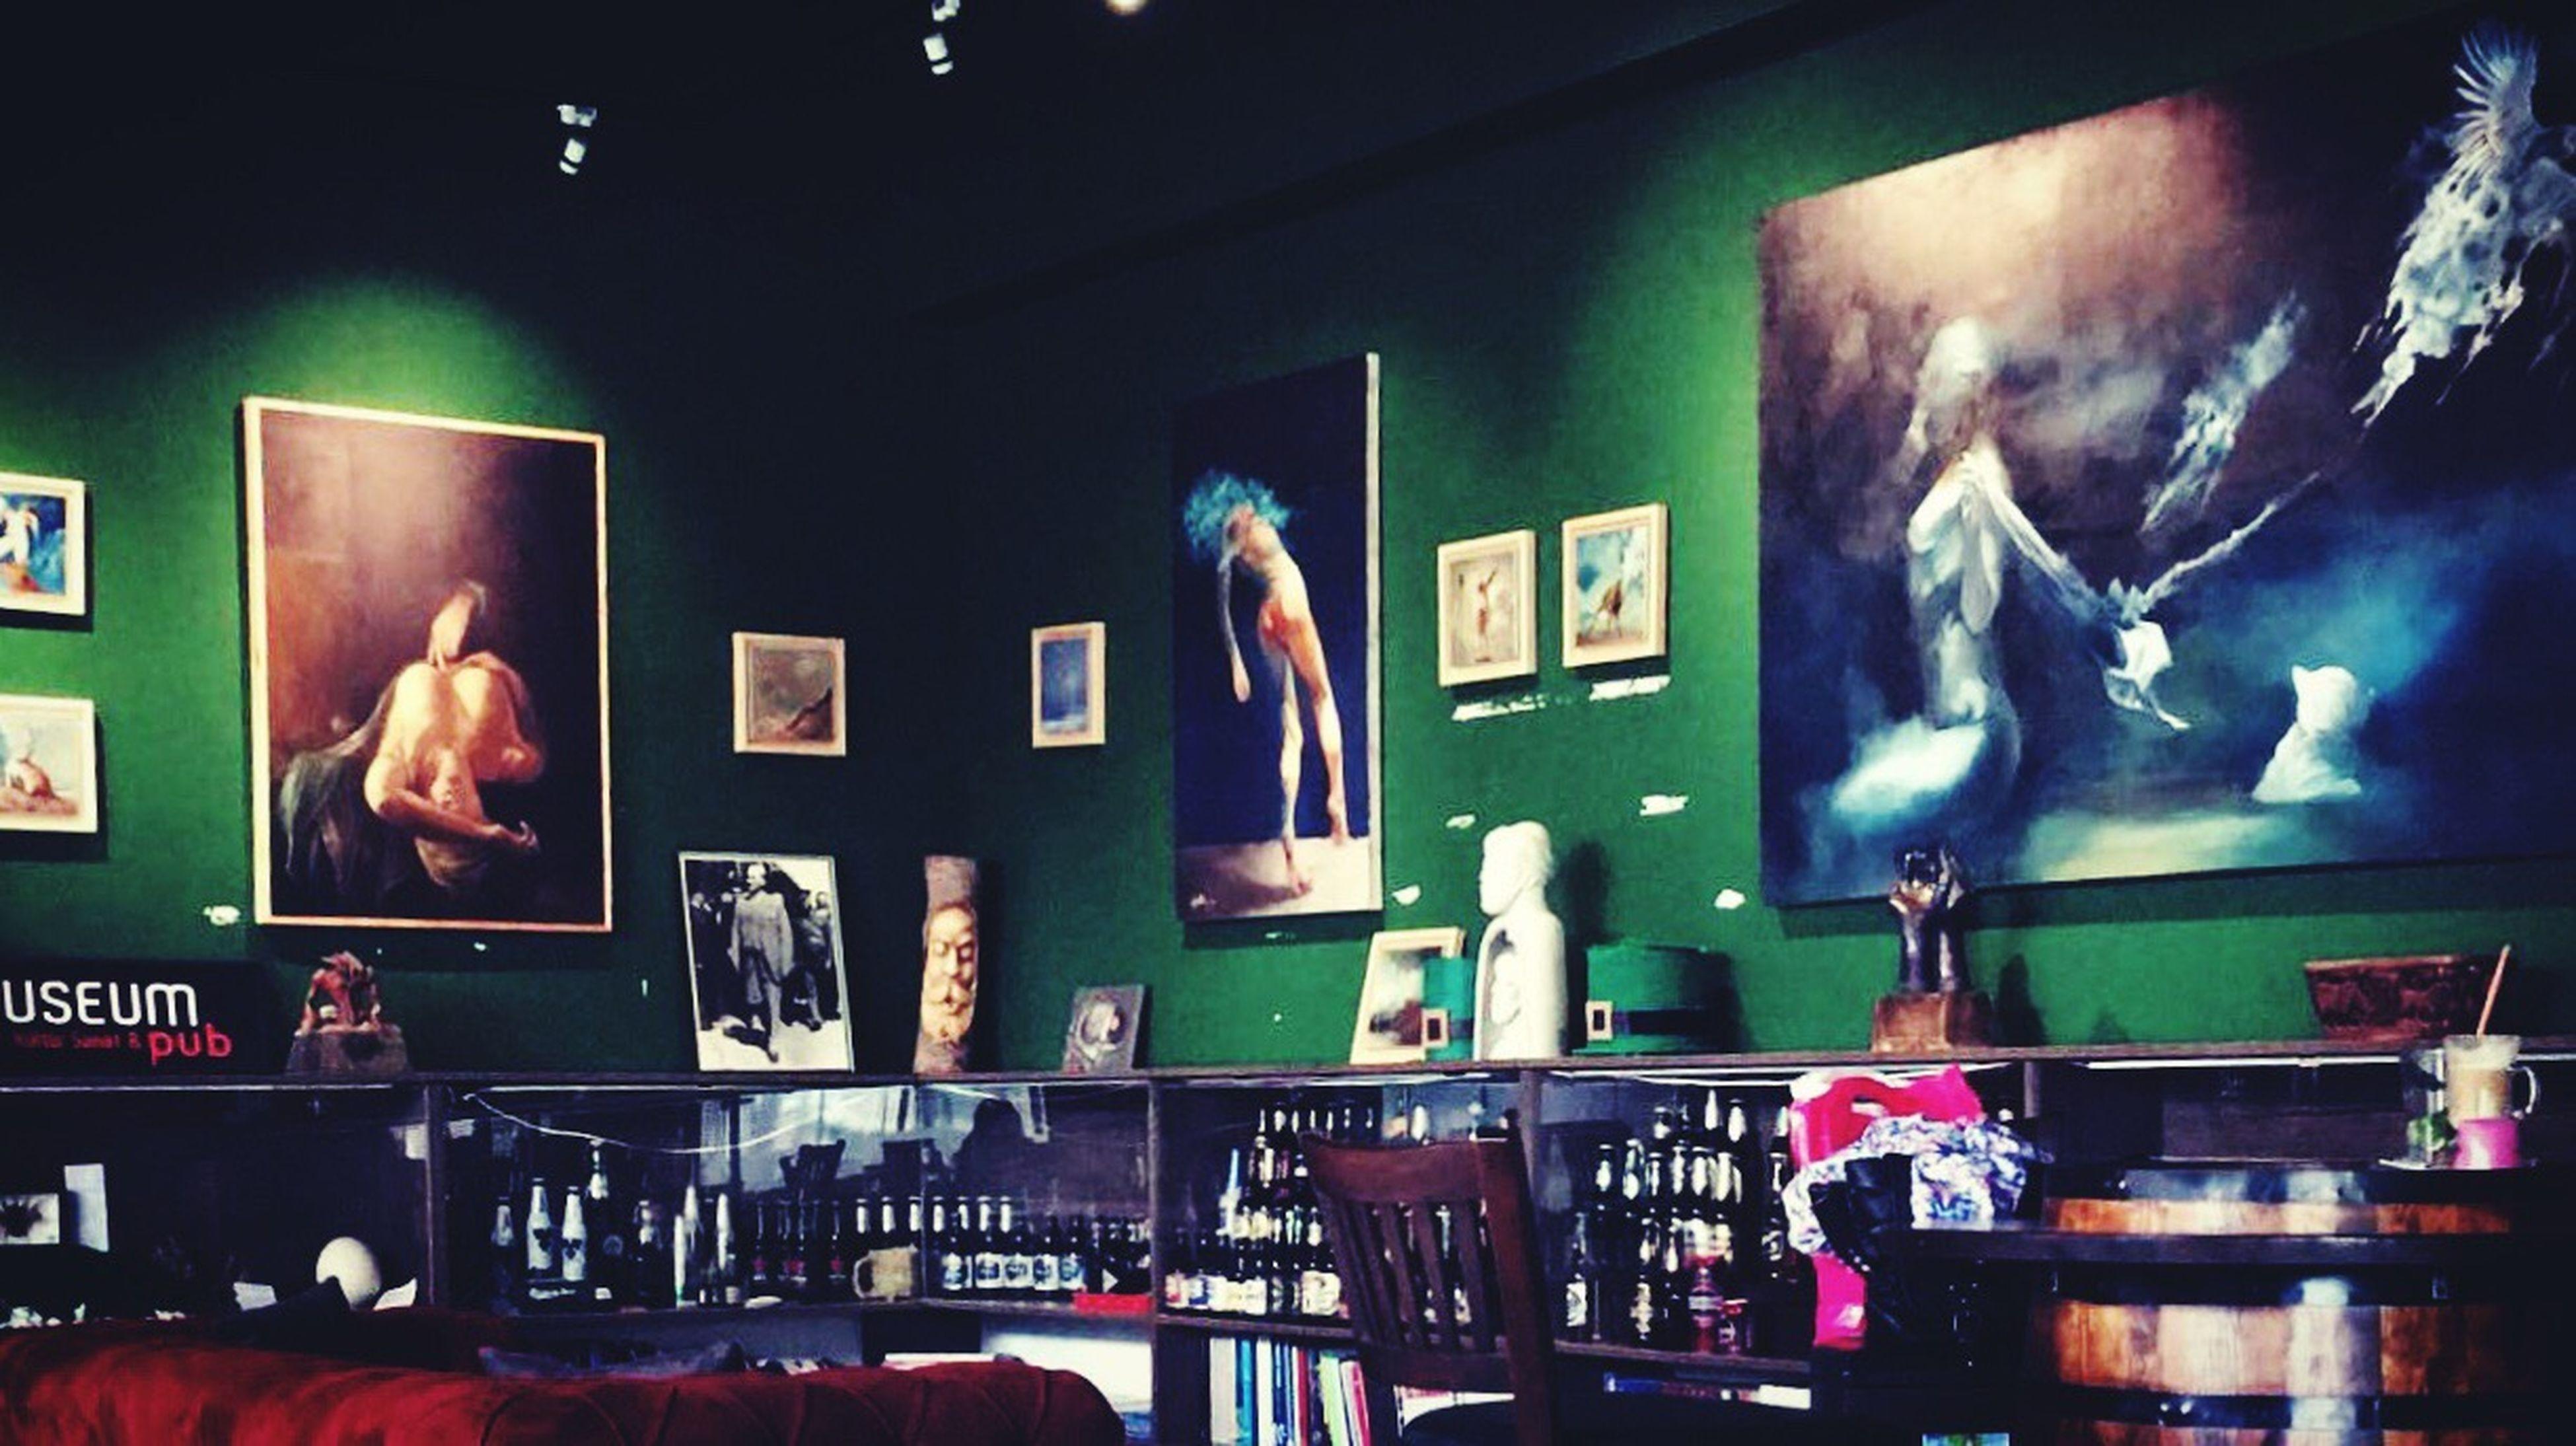 Museum Pub Bar Art ❤️ First Eyeem Photo